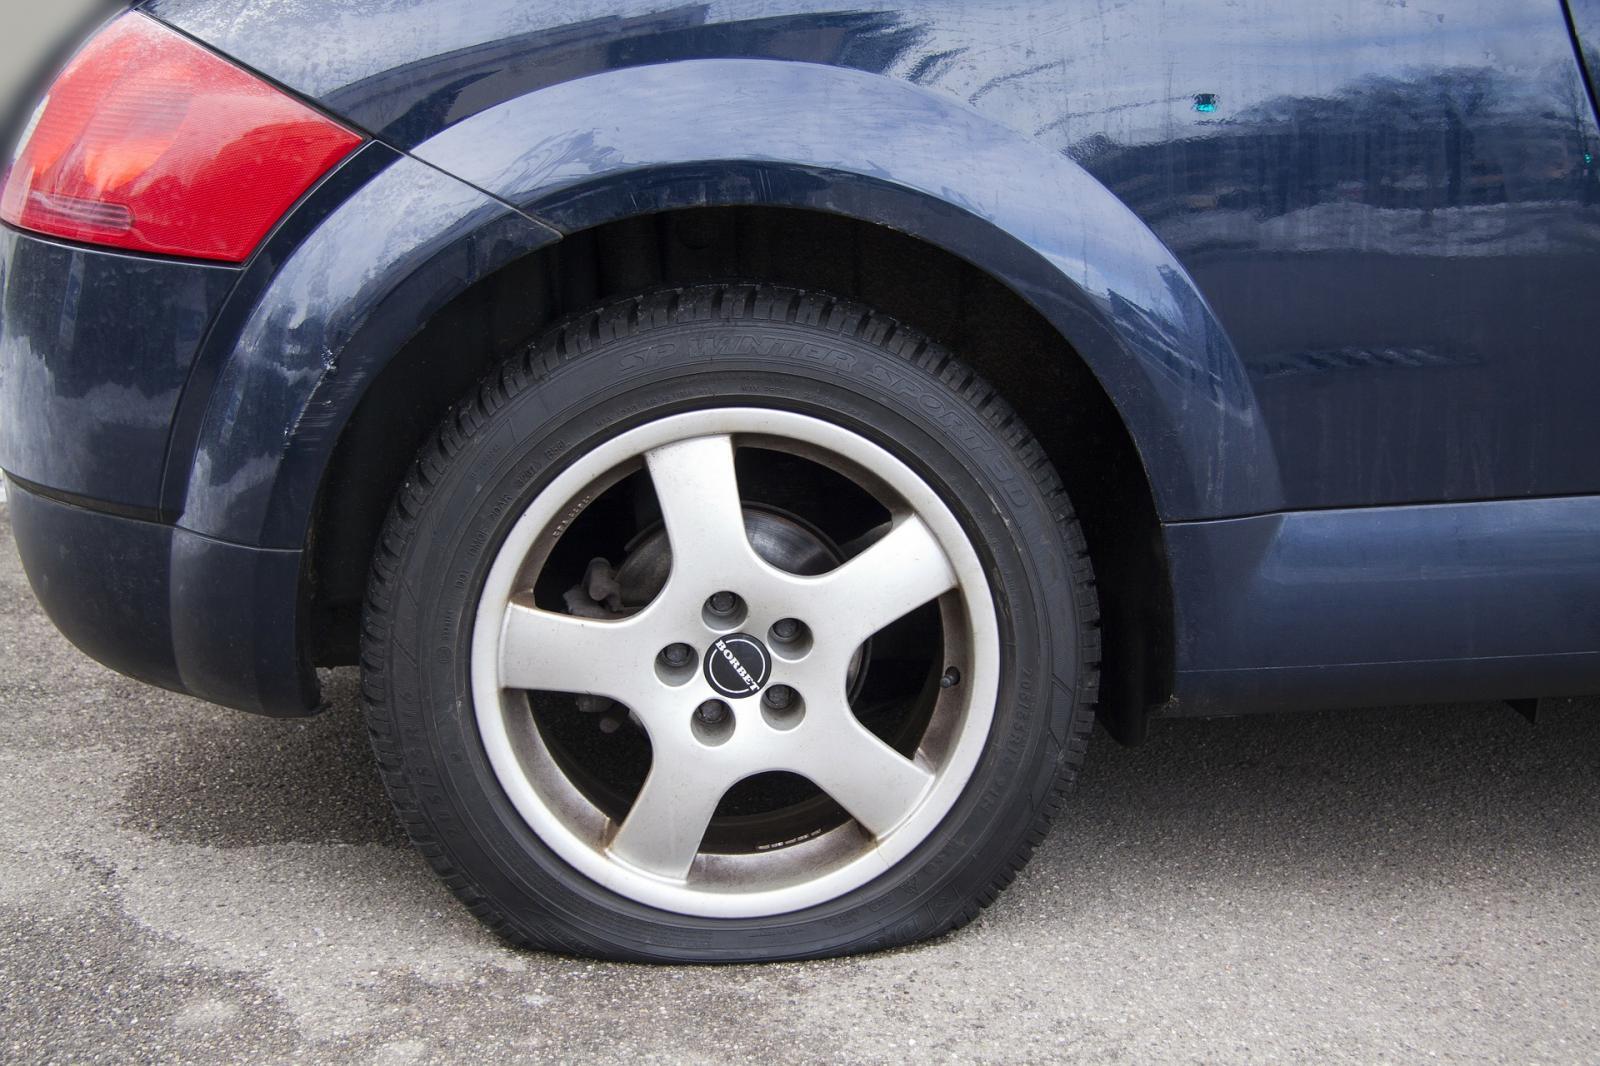 Neumático ponchado